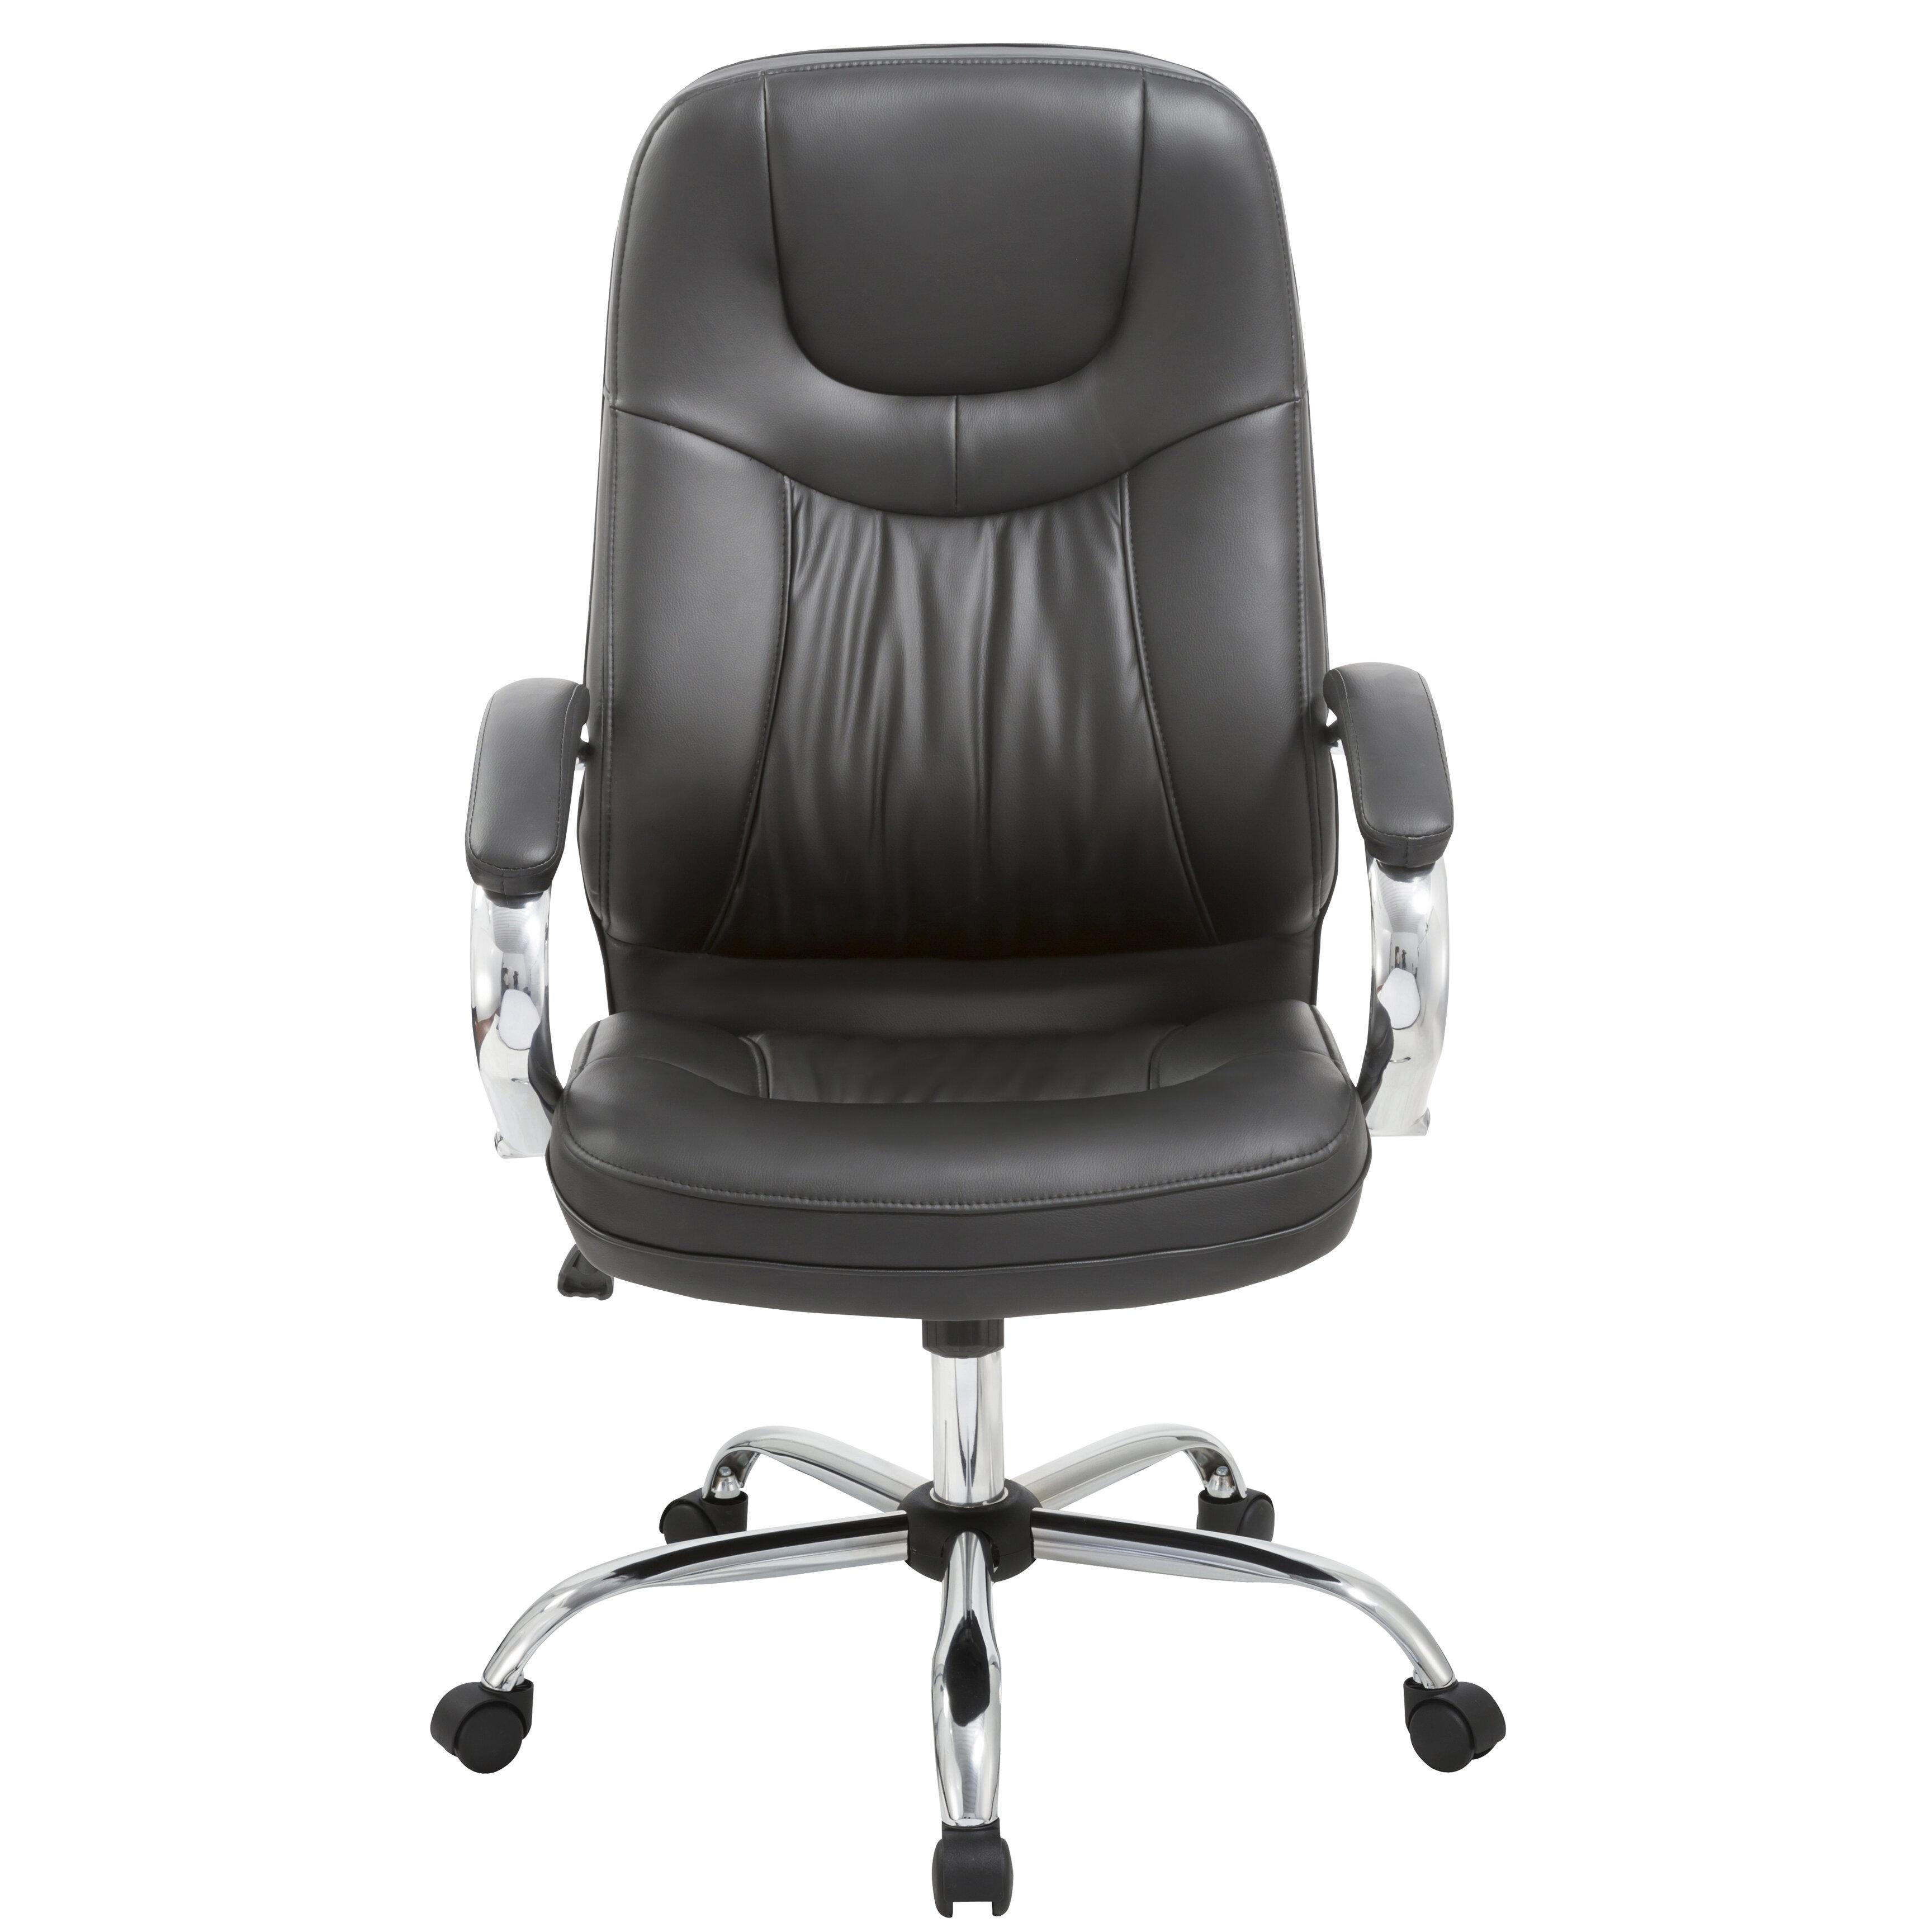 Porthos Home High Back Executive Chair U0026 Reviews | Wayfair